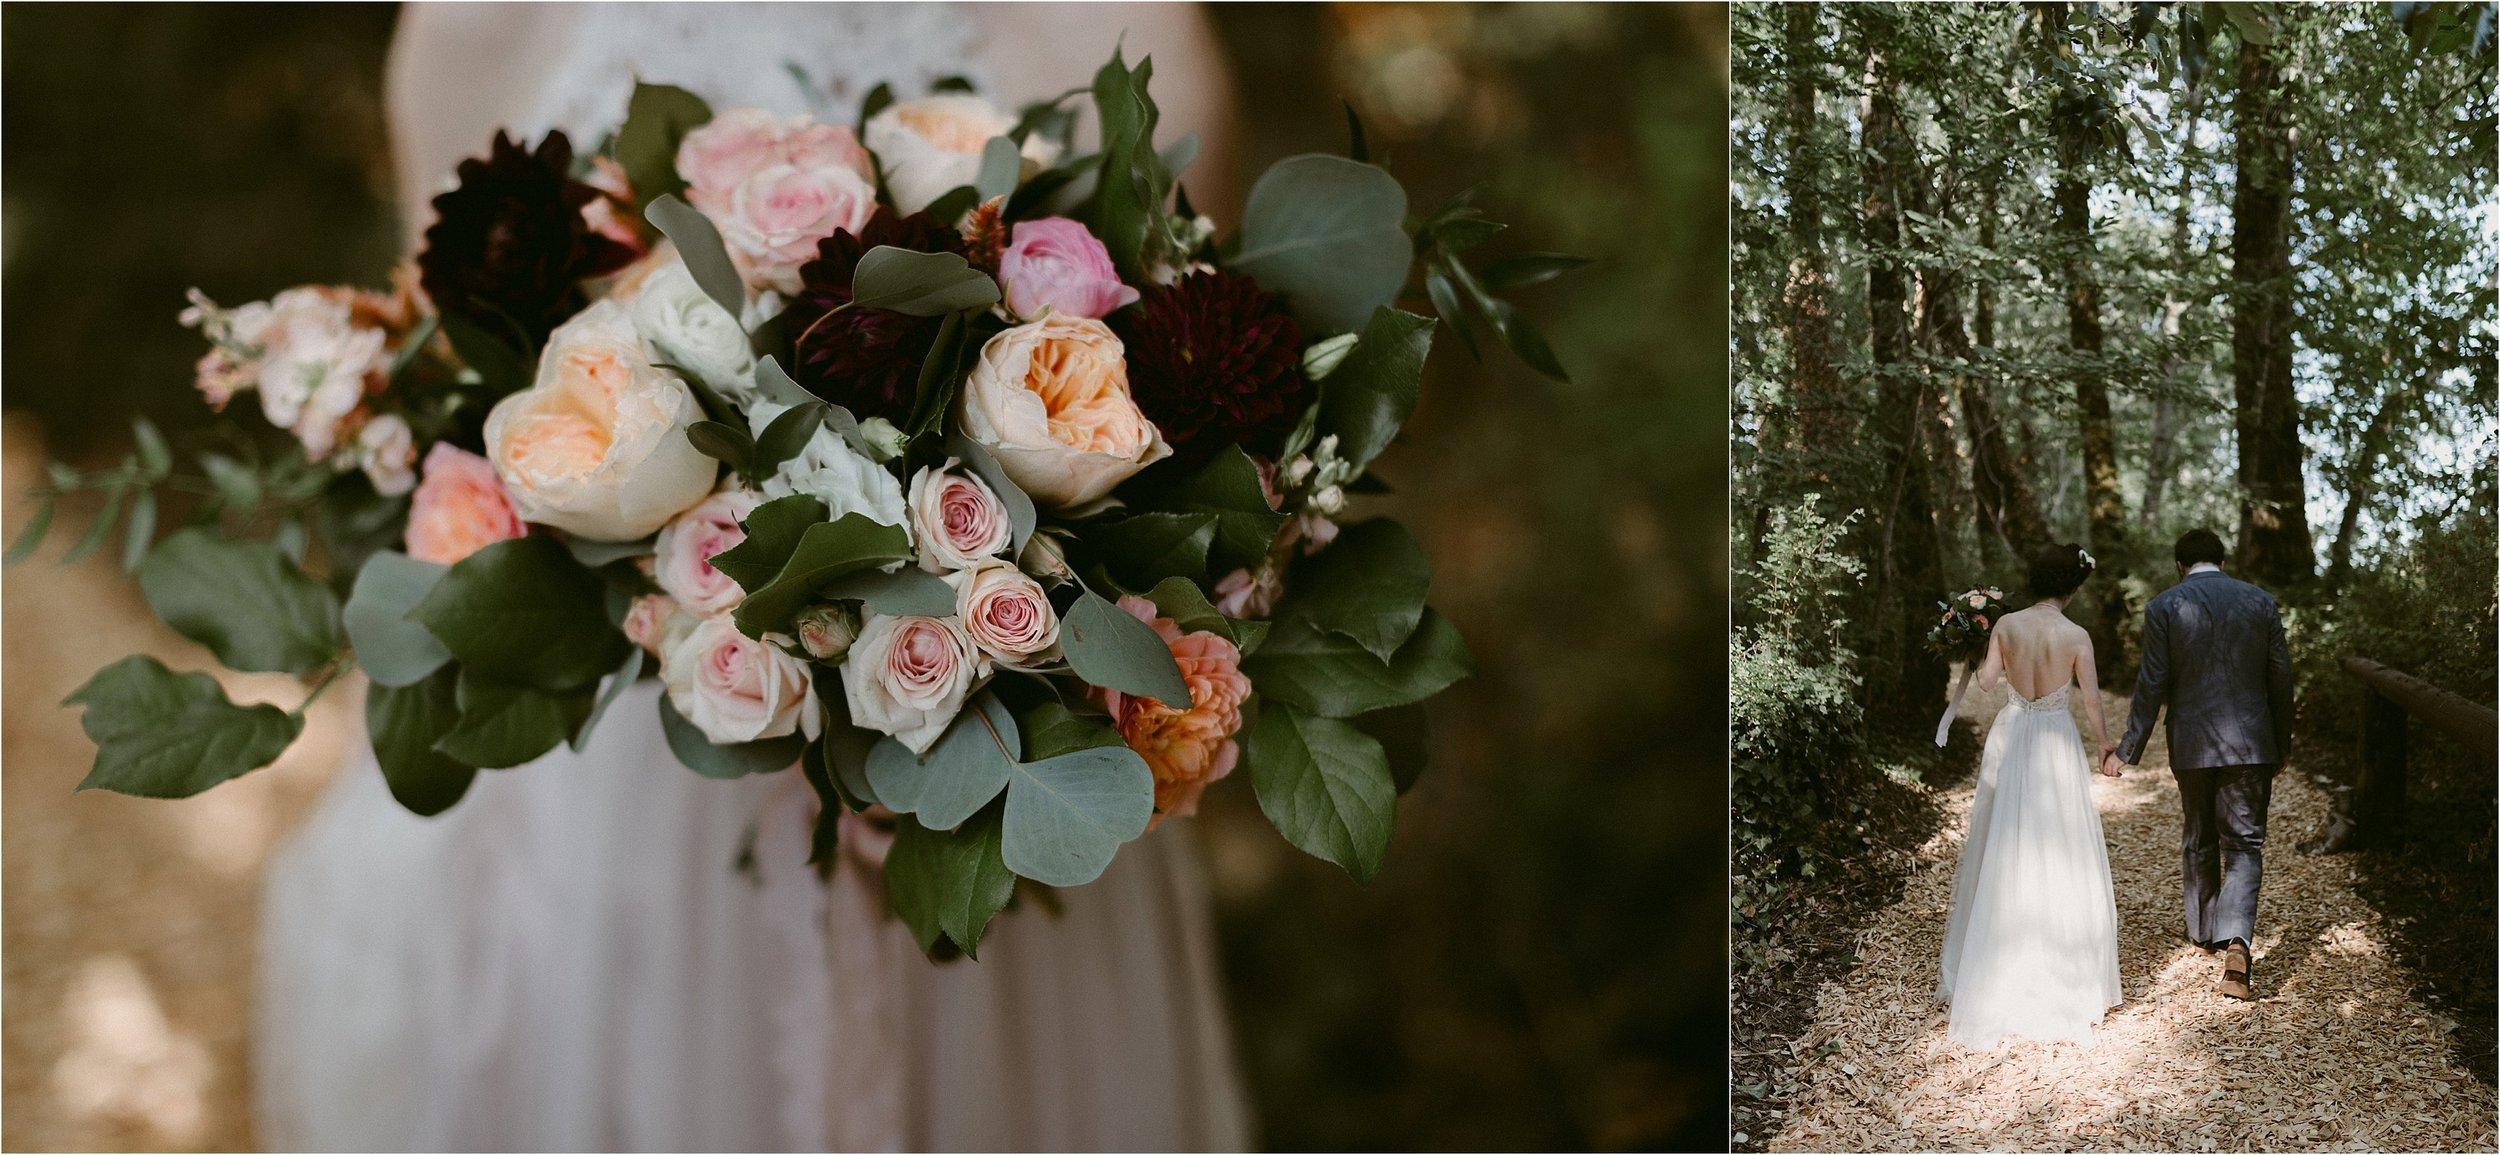 boho-hipster-indie-wedding-portland-wedding-photographer_0324.jpg